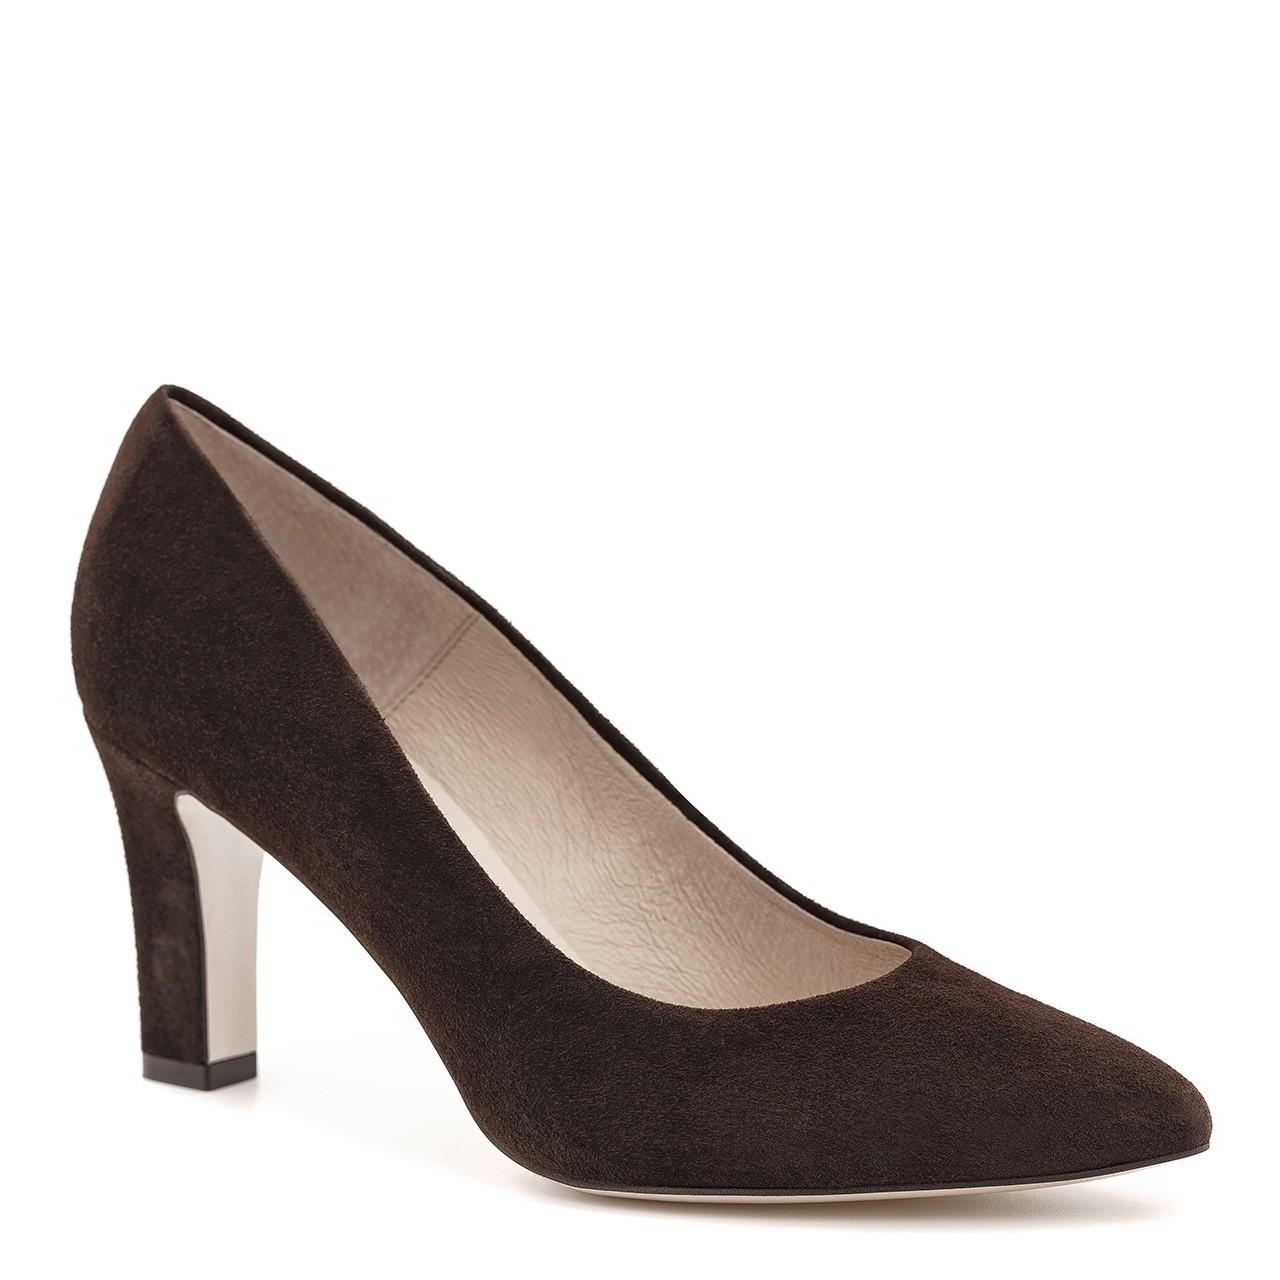 Ciemnobrązowe buty z naturalnej skóry zamszowej na wysokim obcasie